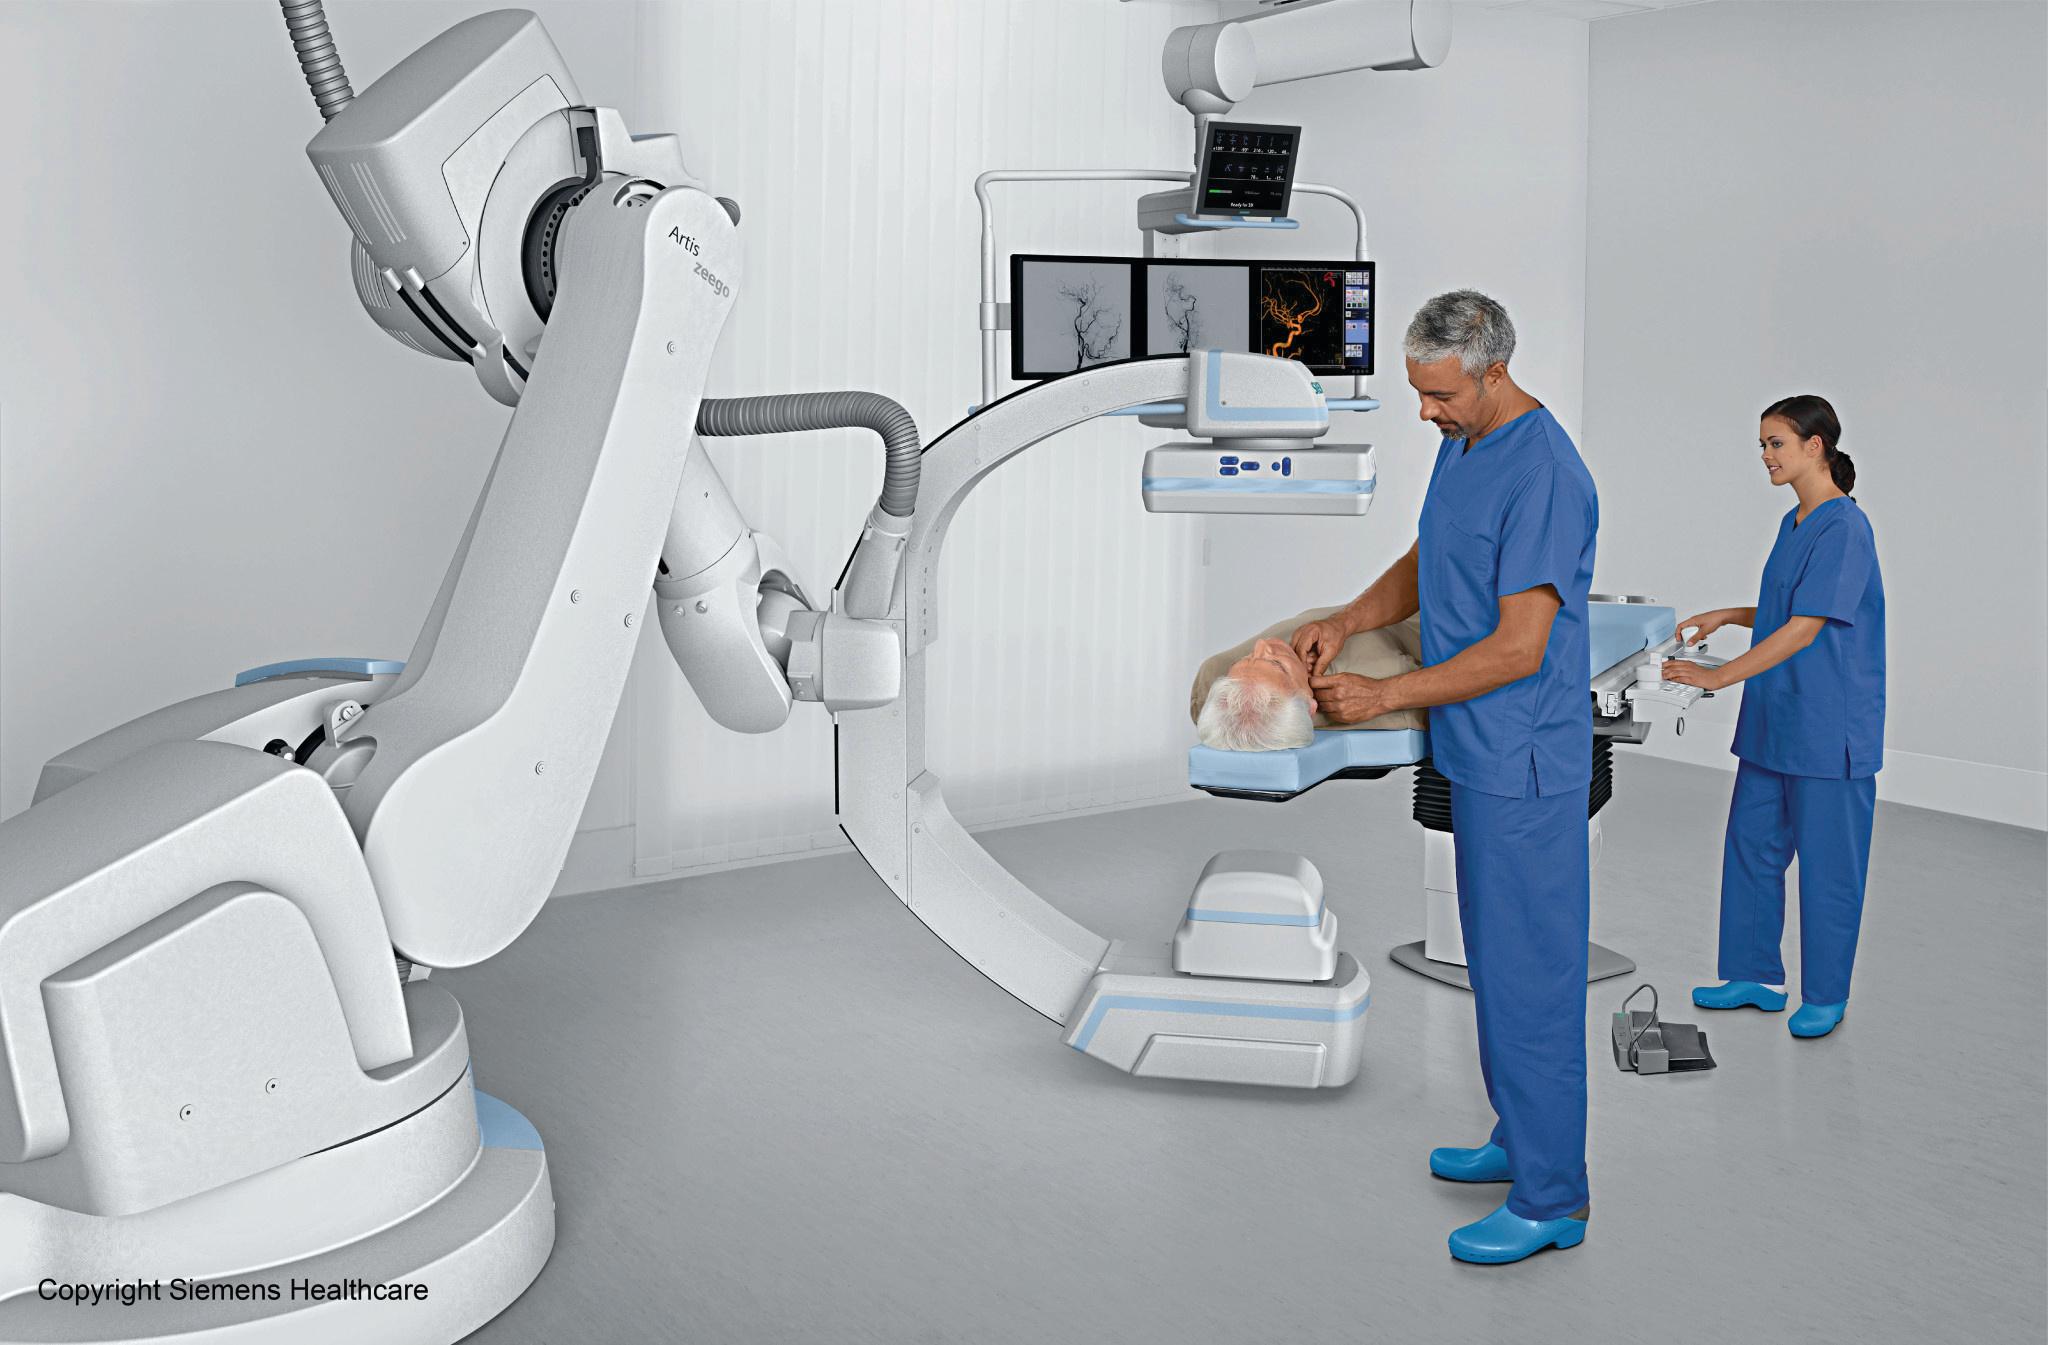 Siemens Healthcare 4